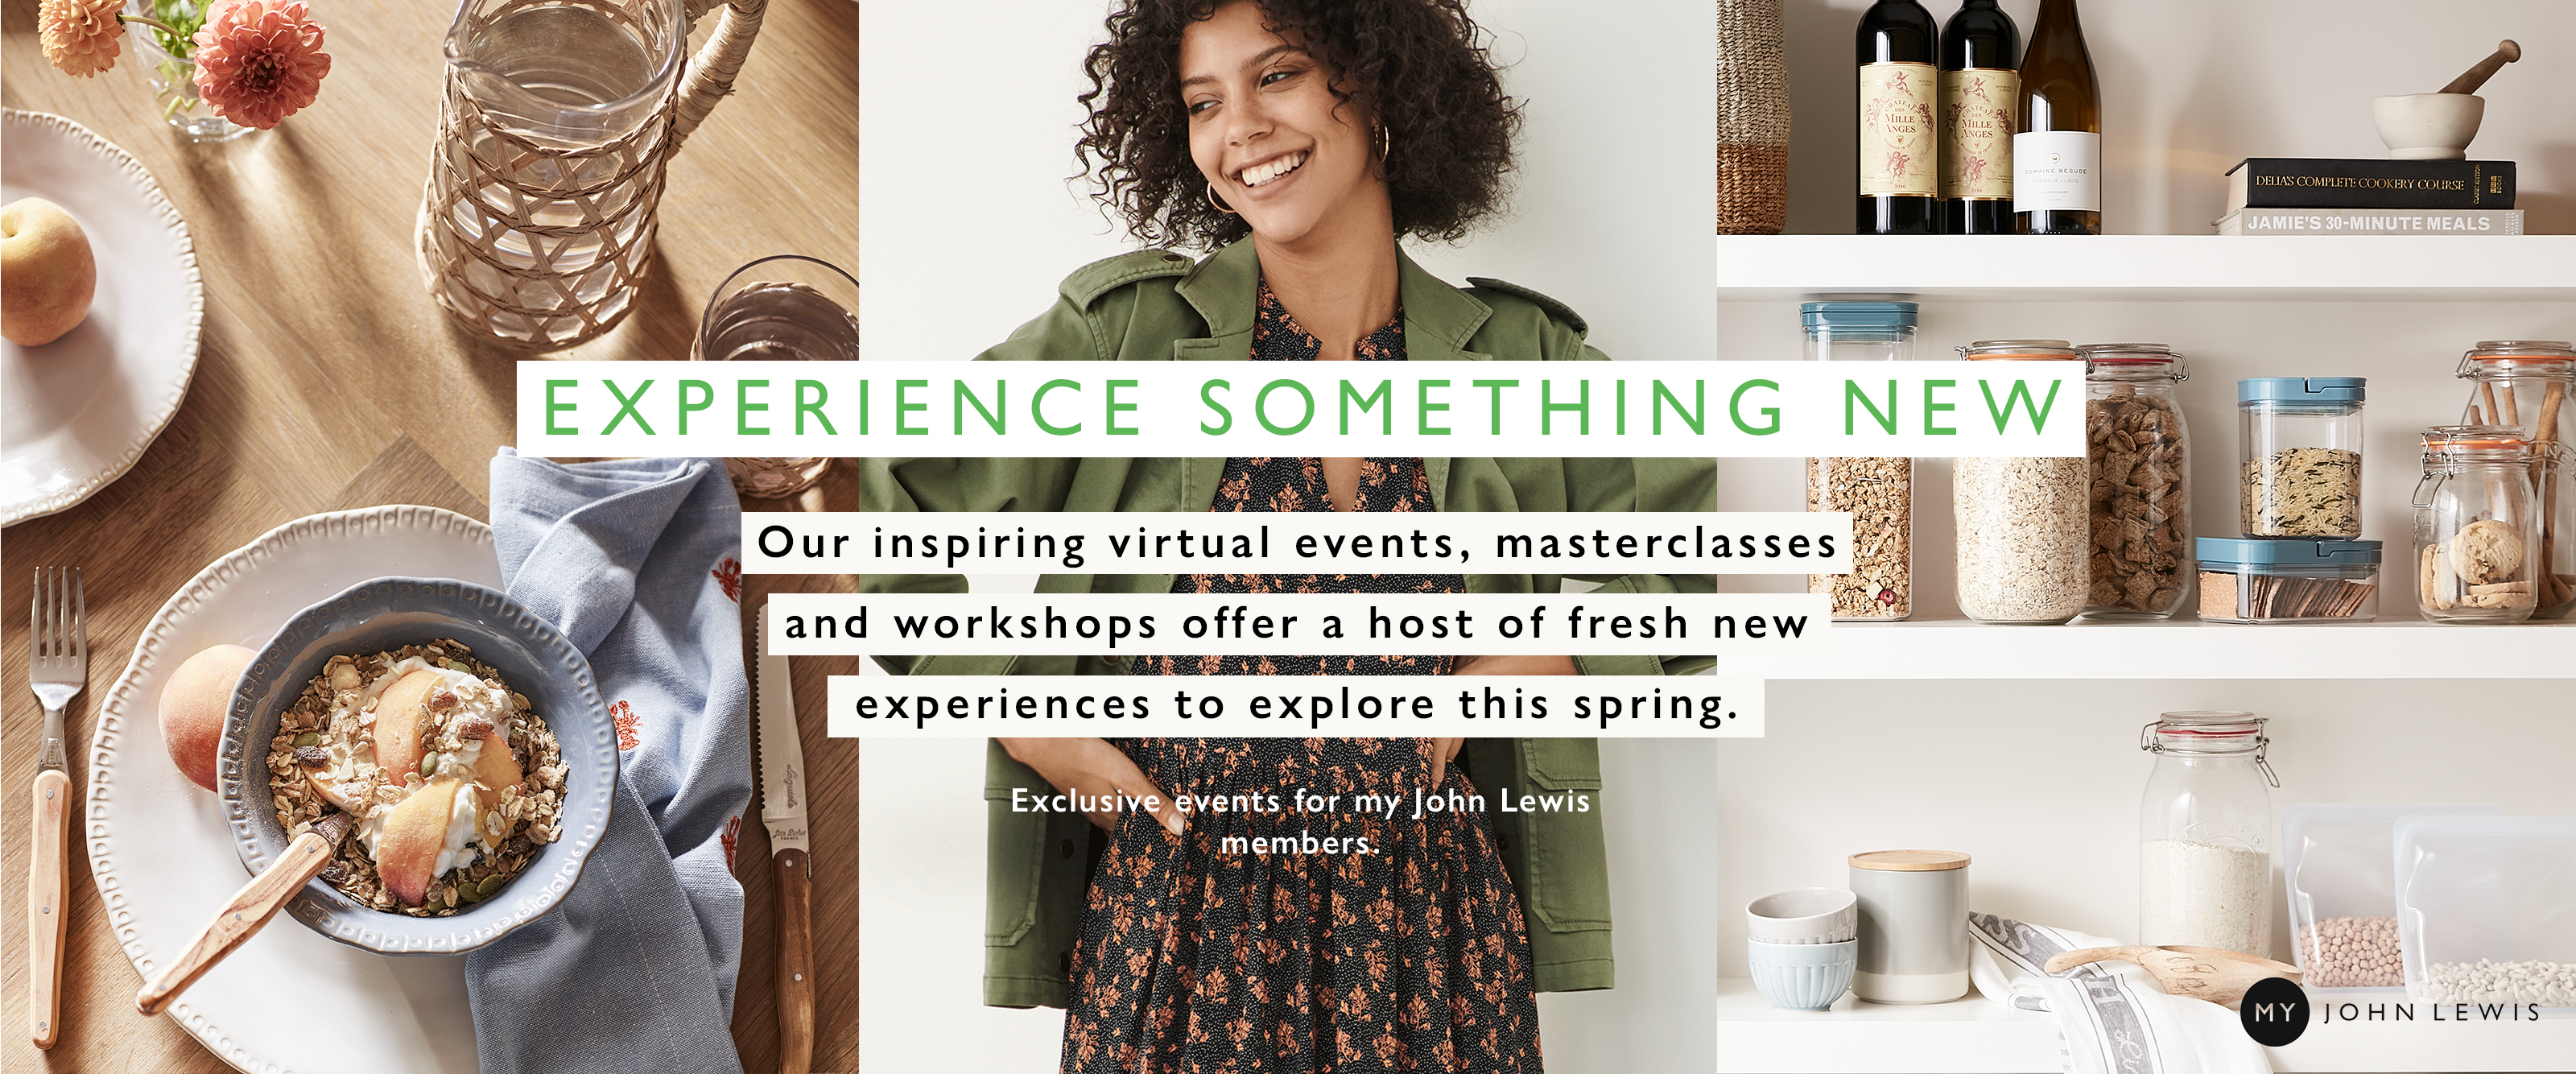 Virtual Festivities 4 November - 24 December link